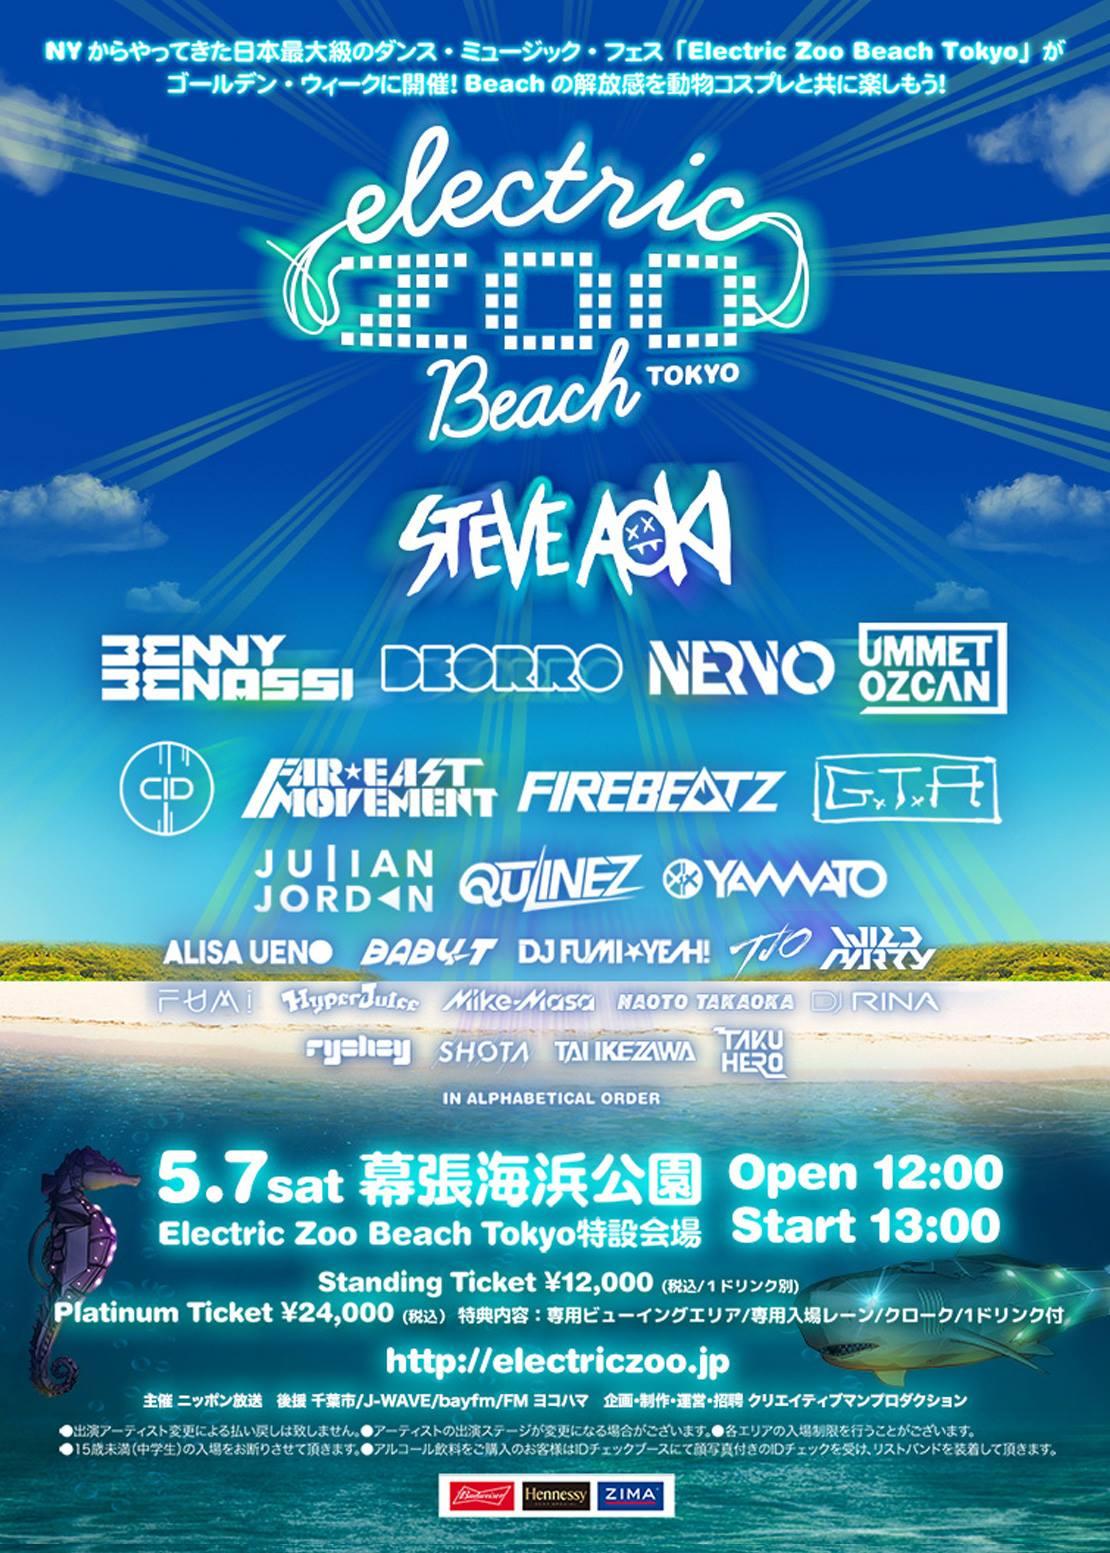 Electric Zoo Beach Tokyo 2016 final lineup